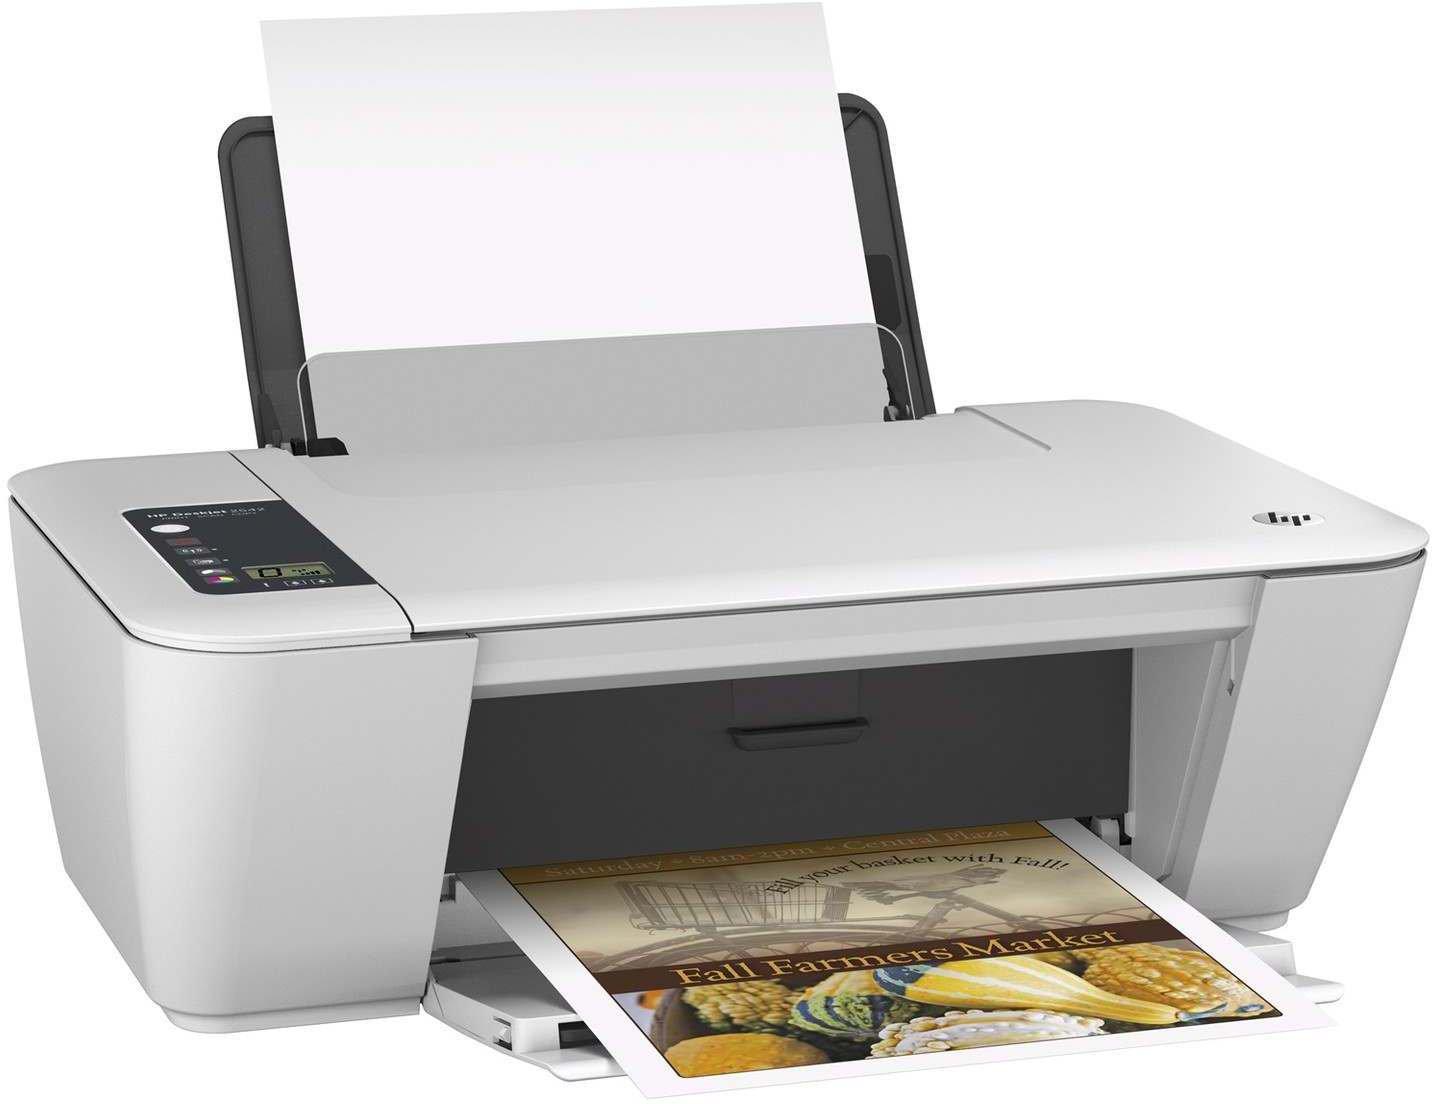 HP Deskjet 2542 All-in-One Wi-Fi Printer. | Rapid PCs